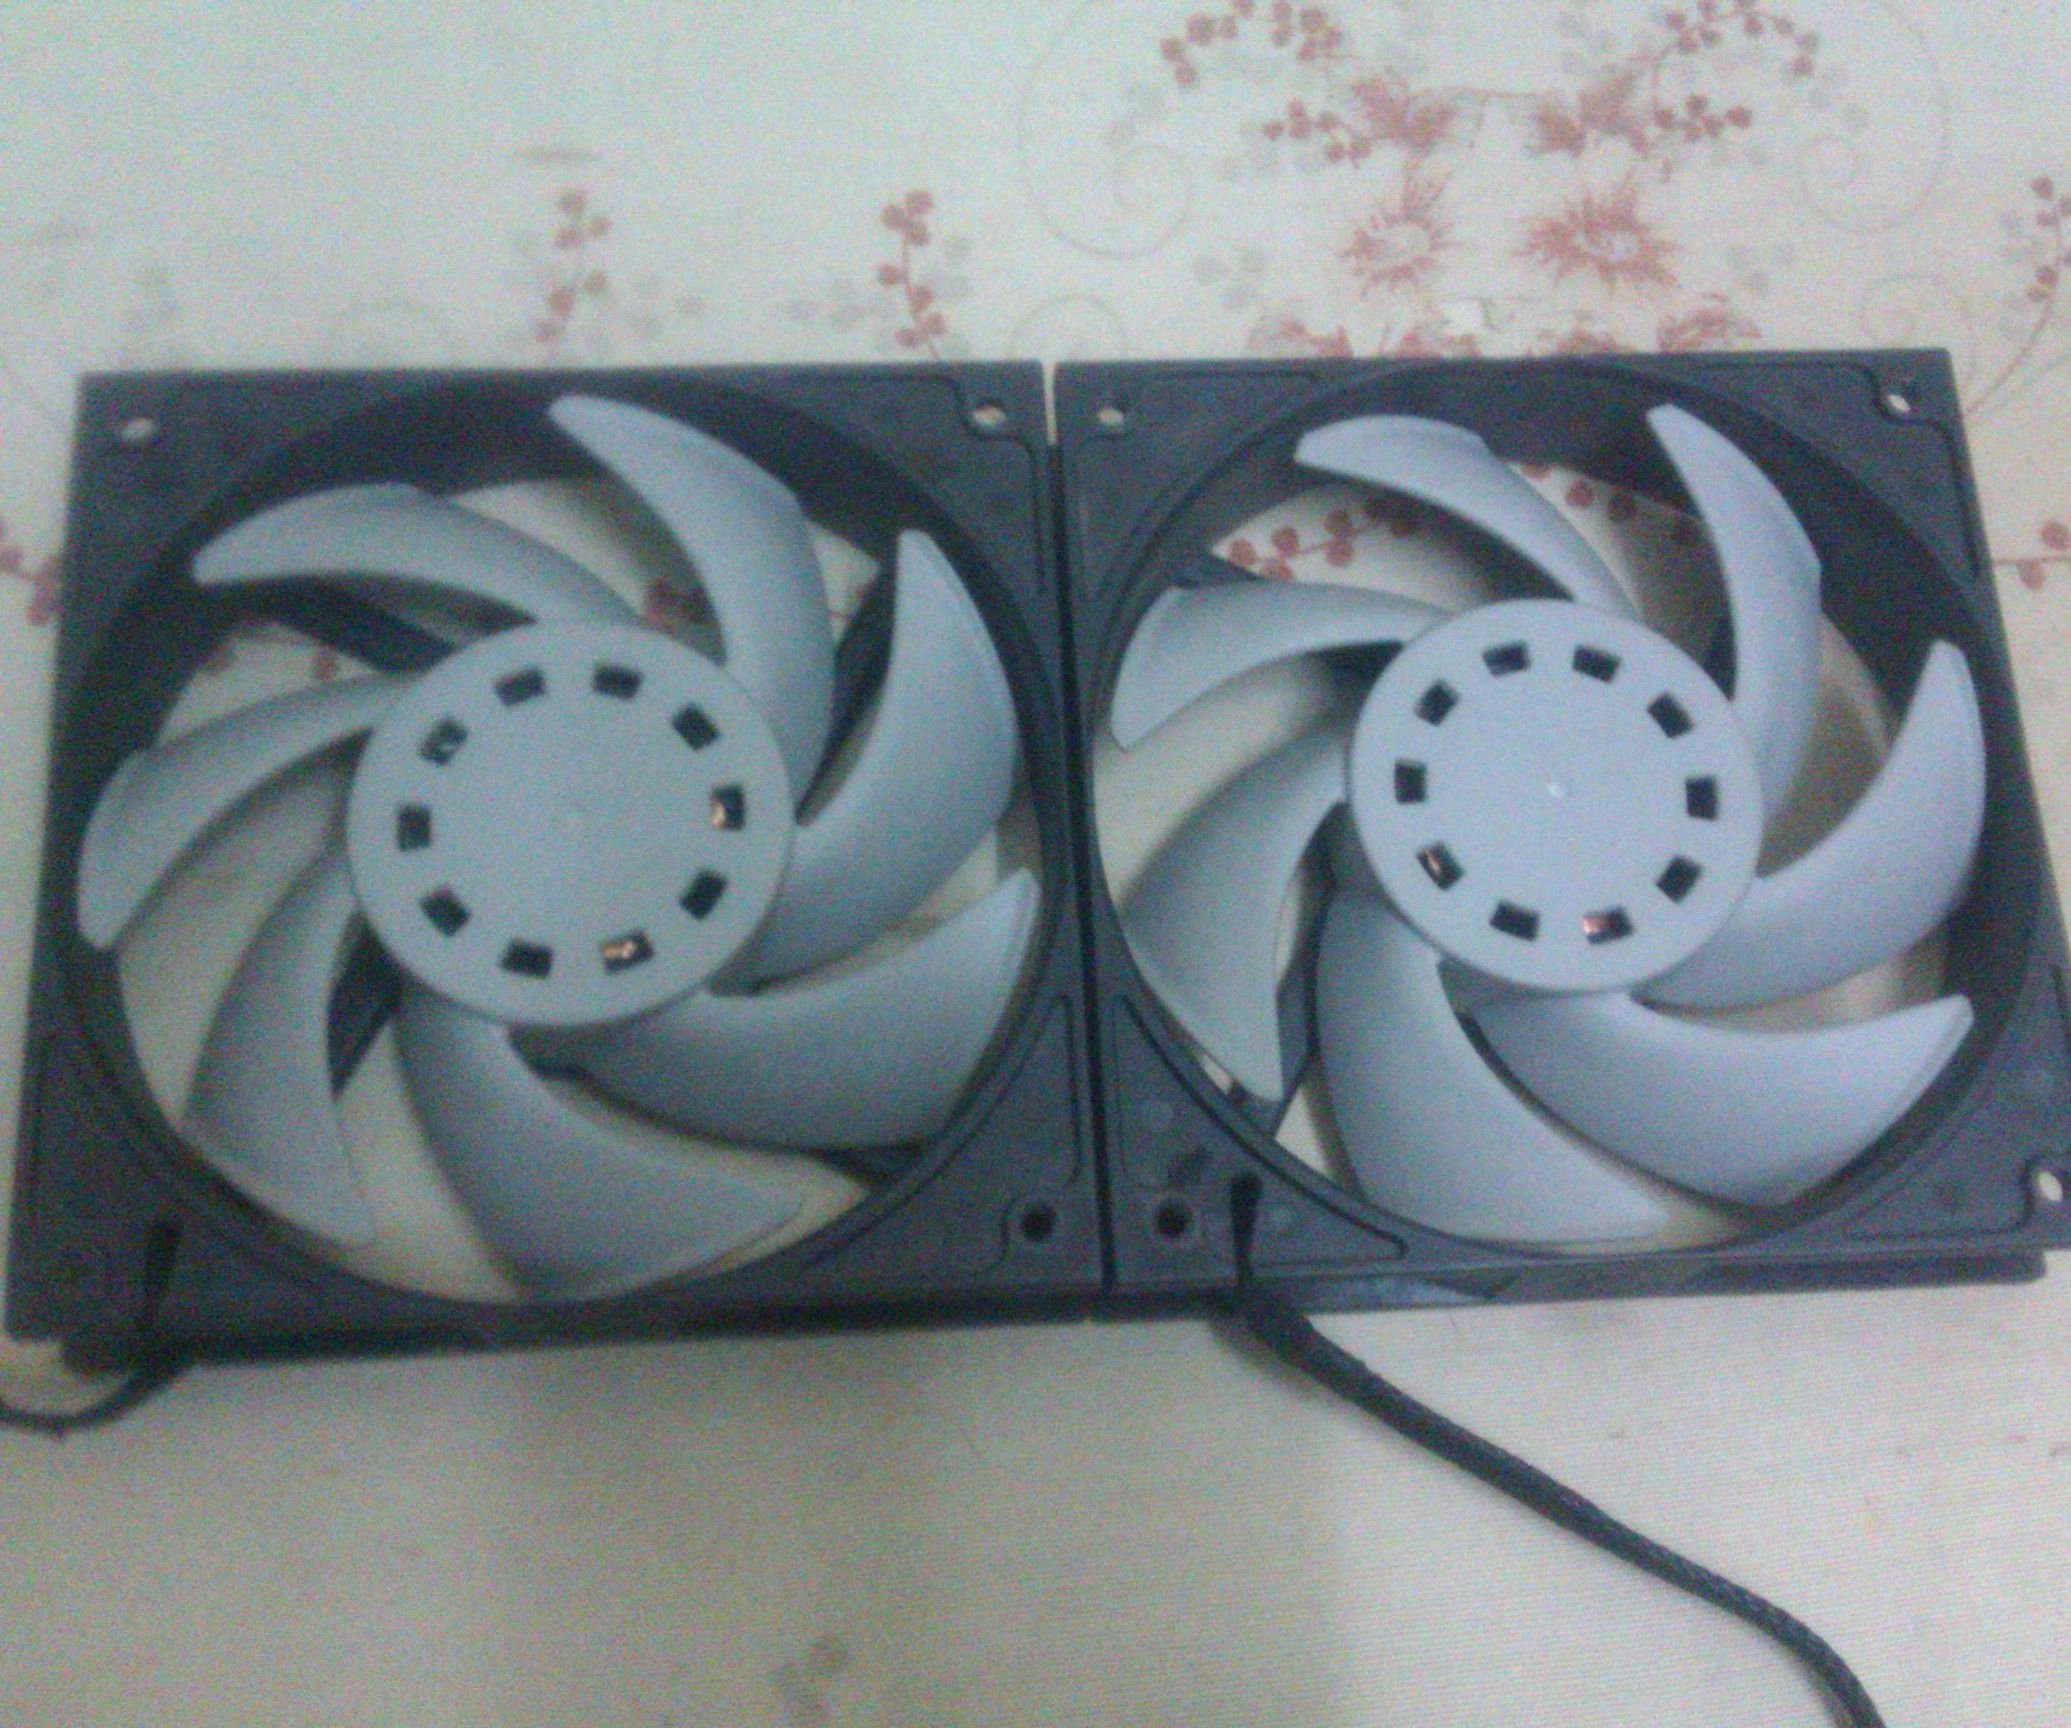 How to open and MOD EK-Vardar F3-120 PC fans